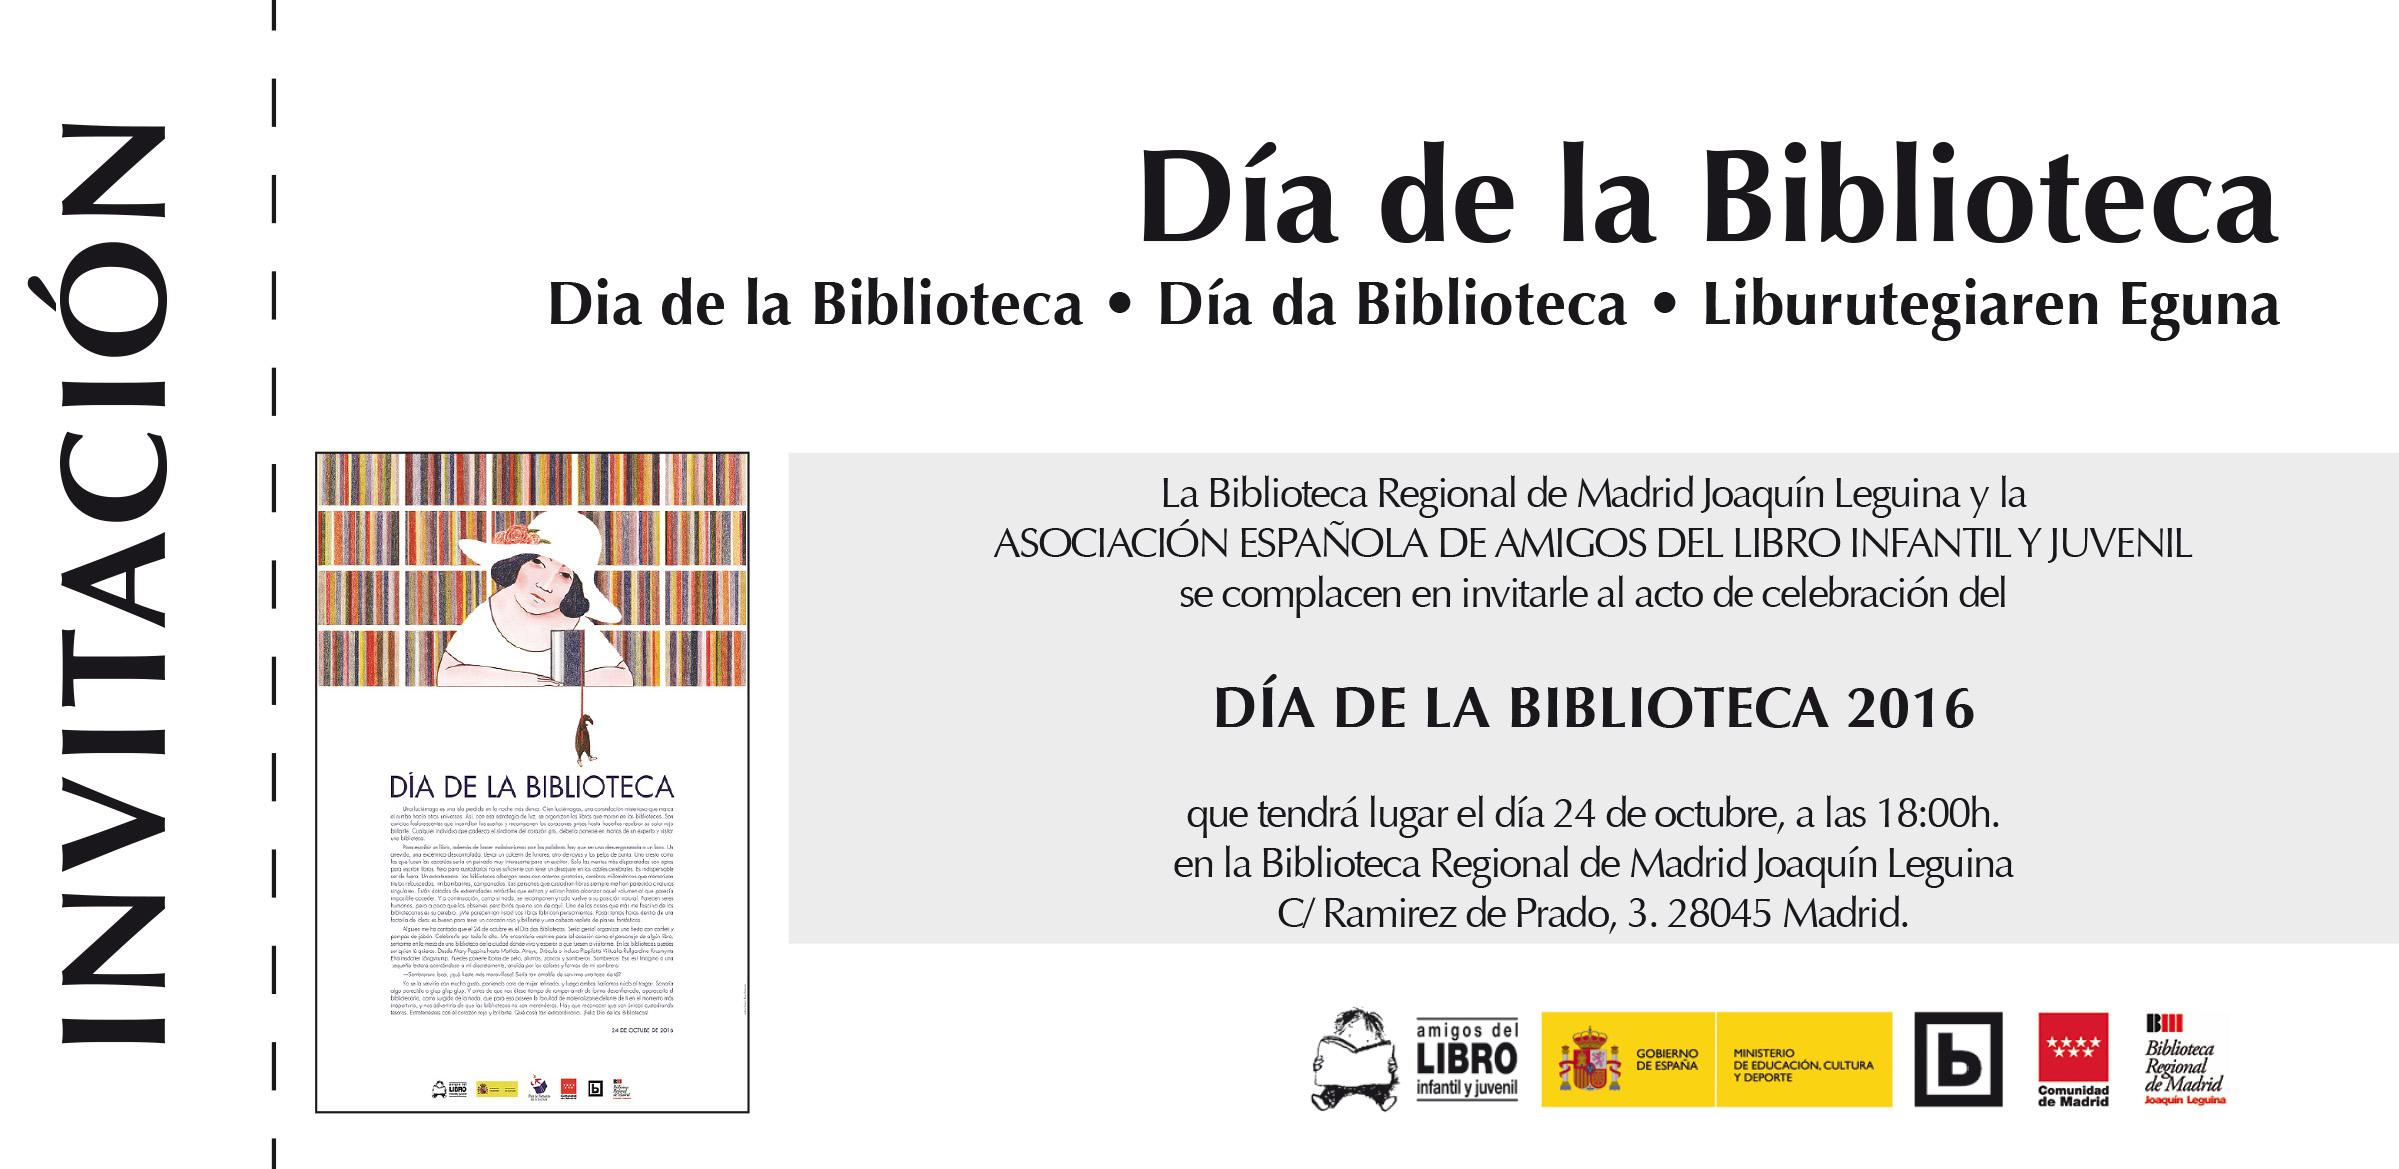 invitaciondiadelabiblioteca2016_individual